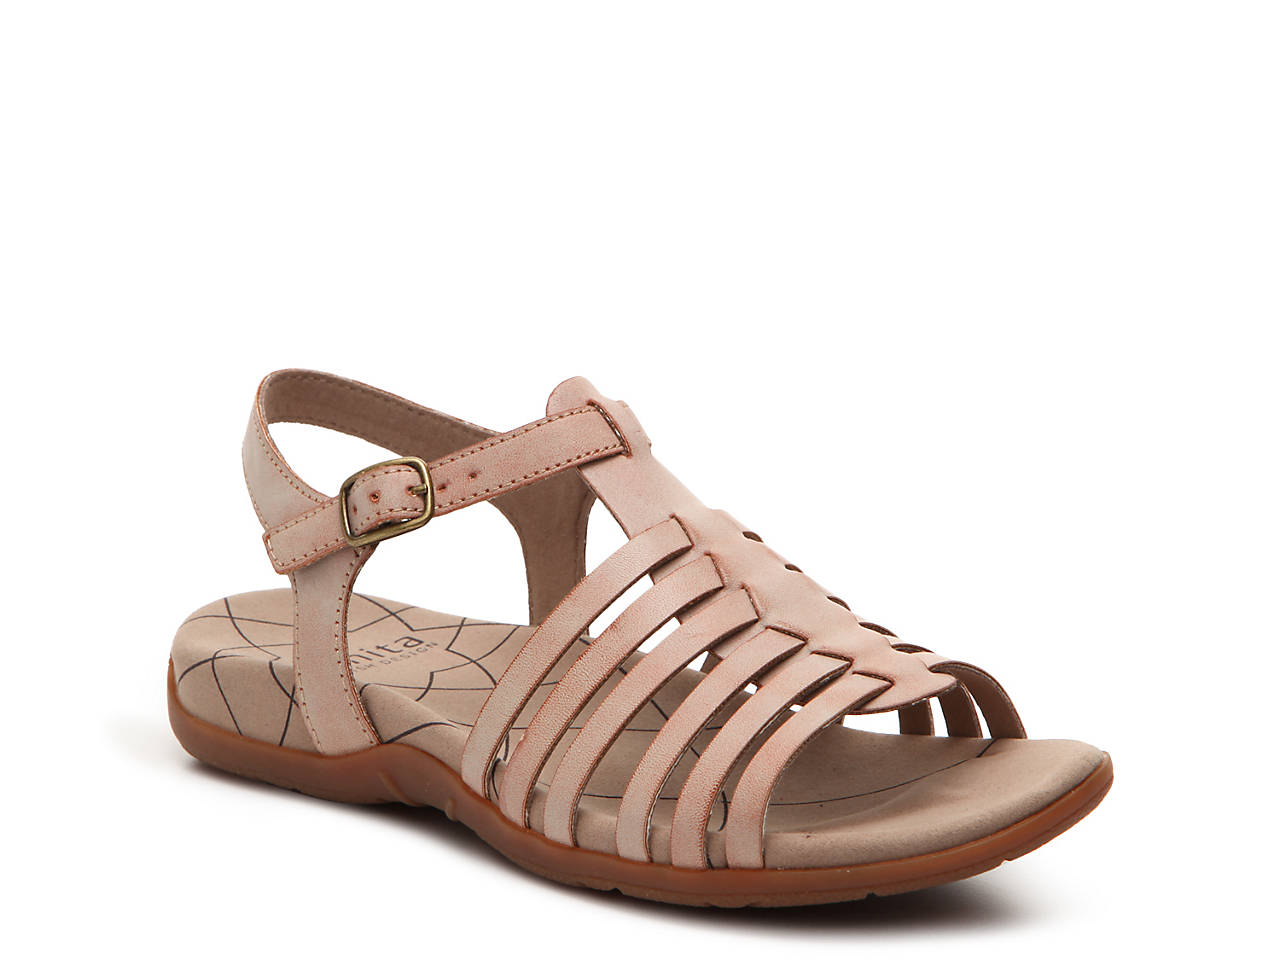 45ffb9d0bf7 Sanita Cadence Gladiator Sandal Women s Shoes